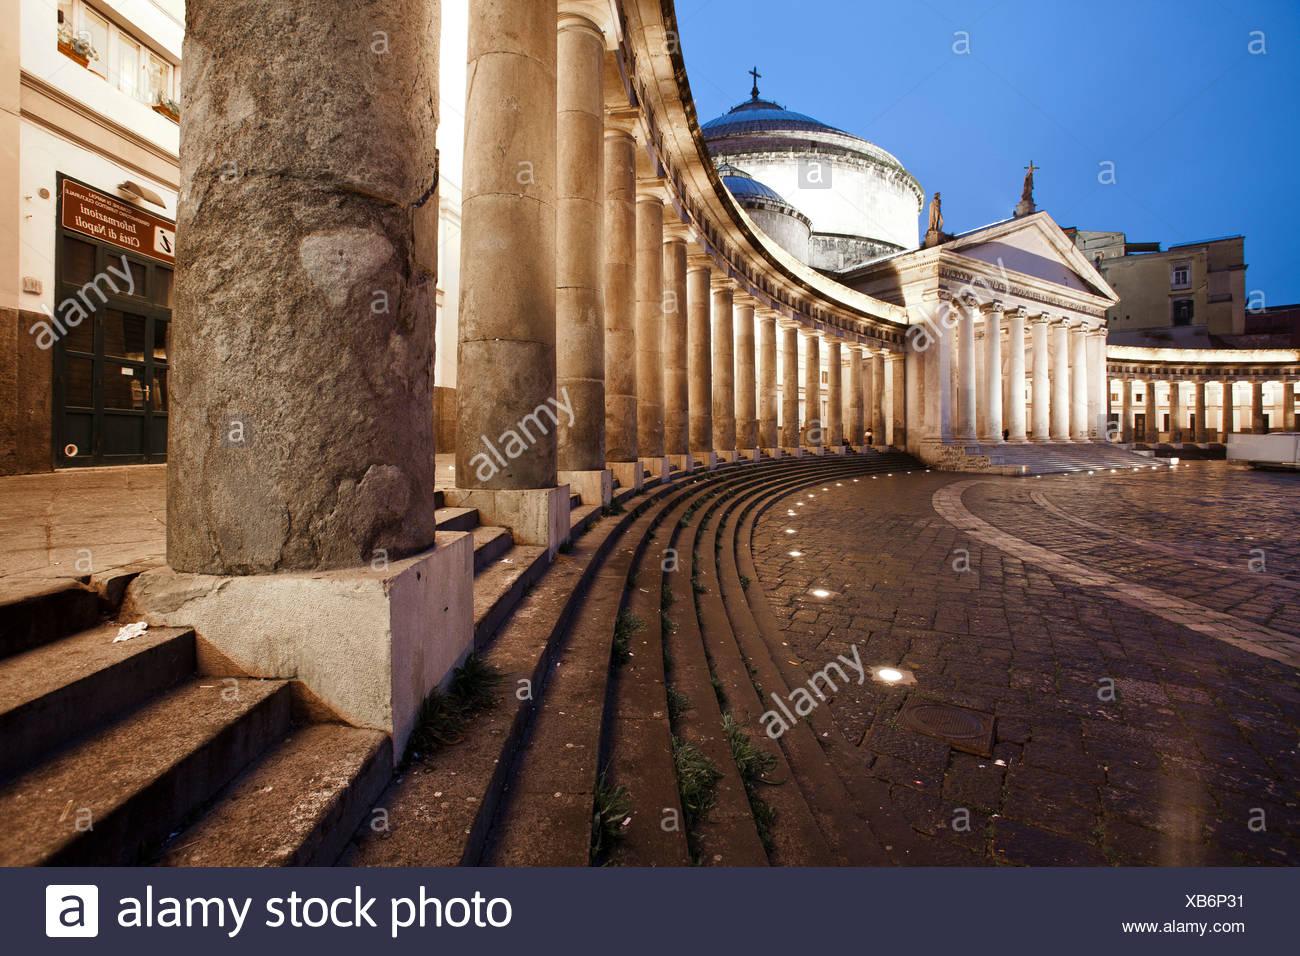 Abendstimmung, Campania, Golf von Neapel, Italien, Kampanien, Meer, Mittelmeer, Neapel, Piazza, Piazza Plebiscito, Platz - Stock Image